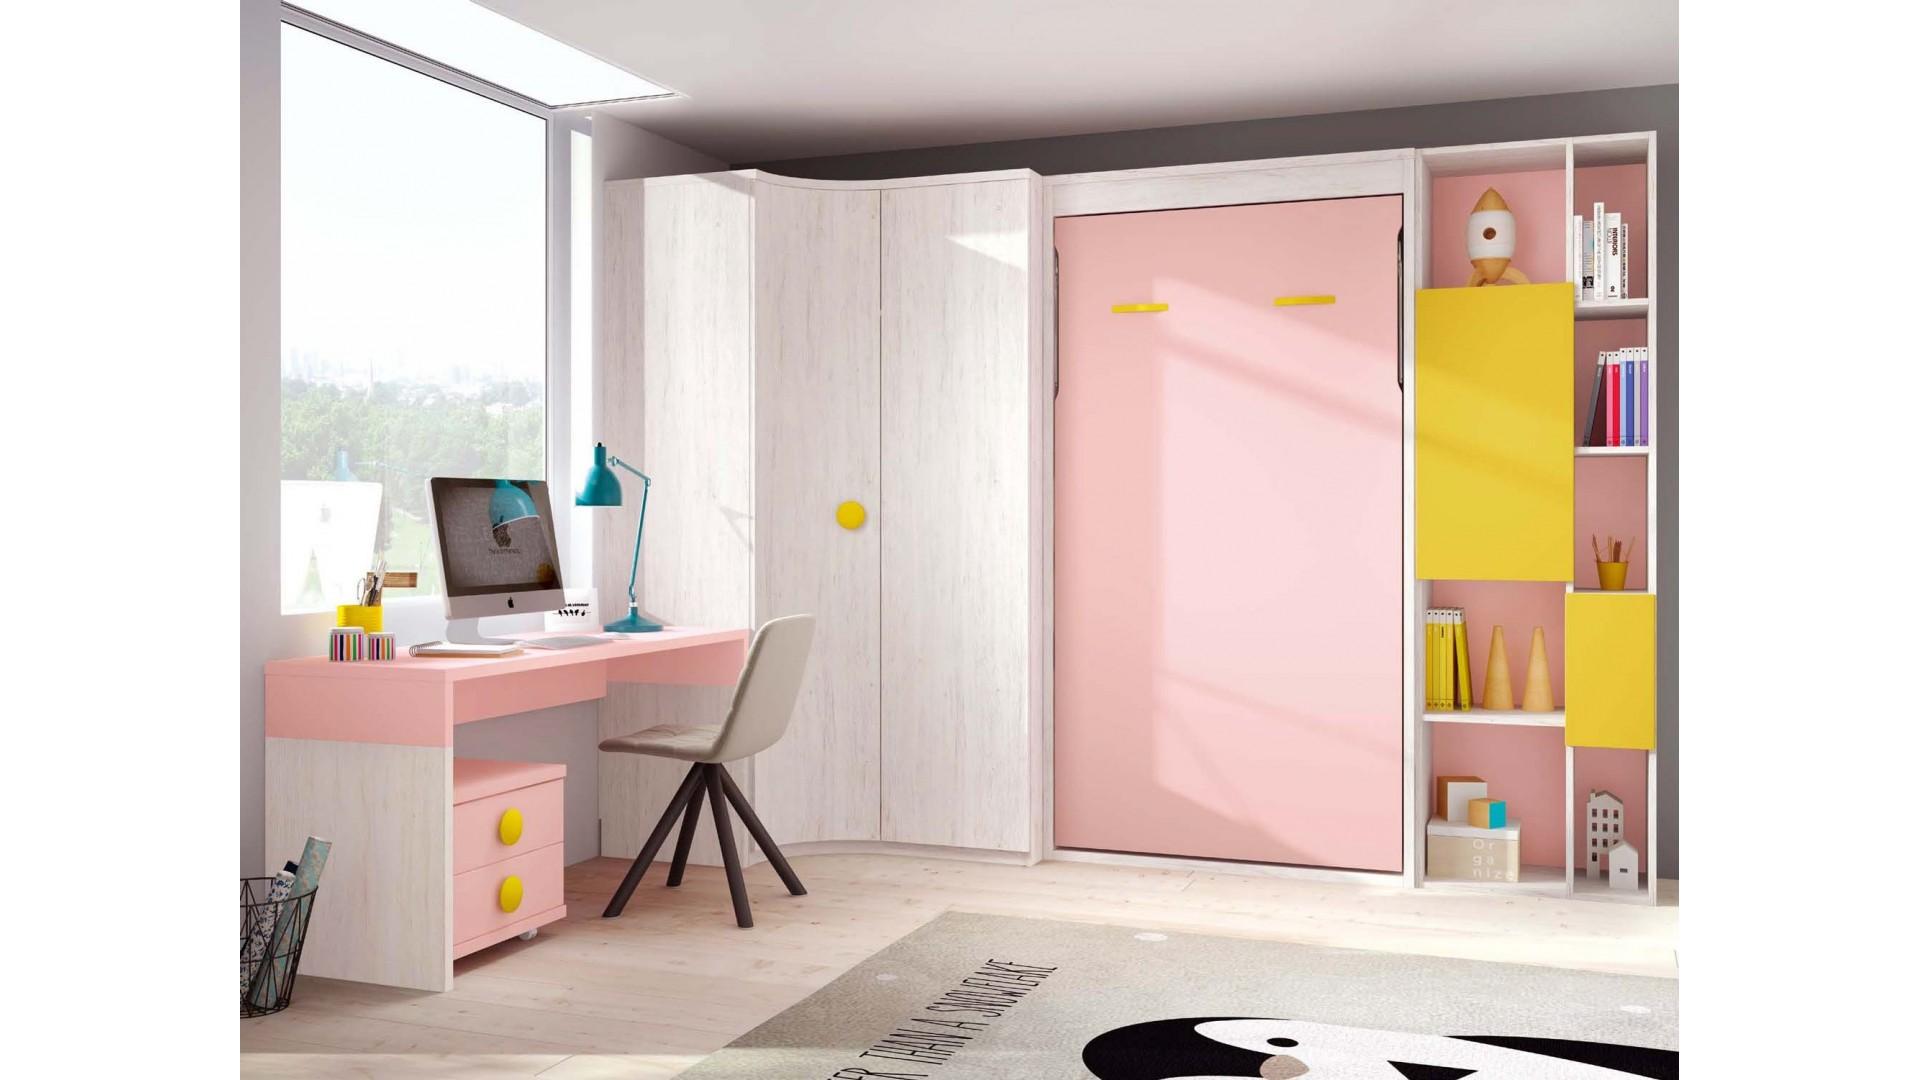 lit escamotable vertical avec chambre glicerio so nuit. Black Bedroom Furniture Sets. Home Design Ideas